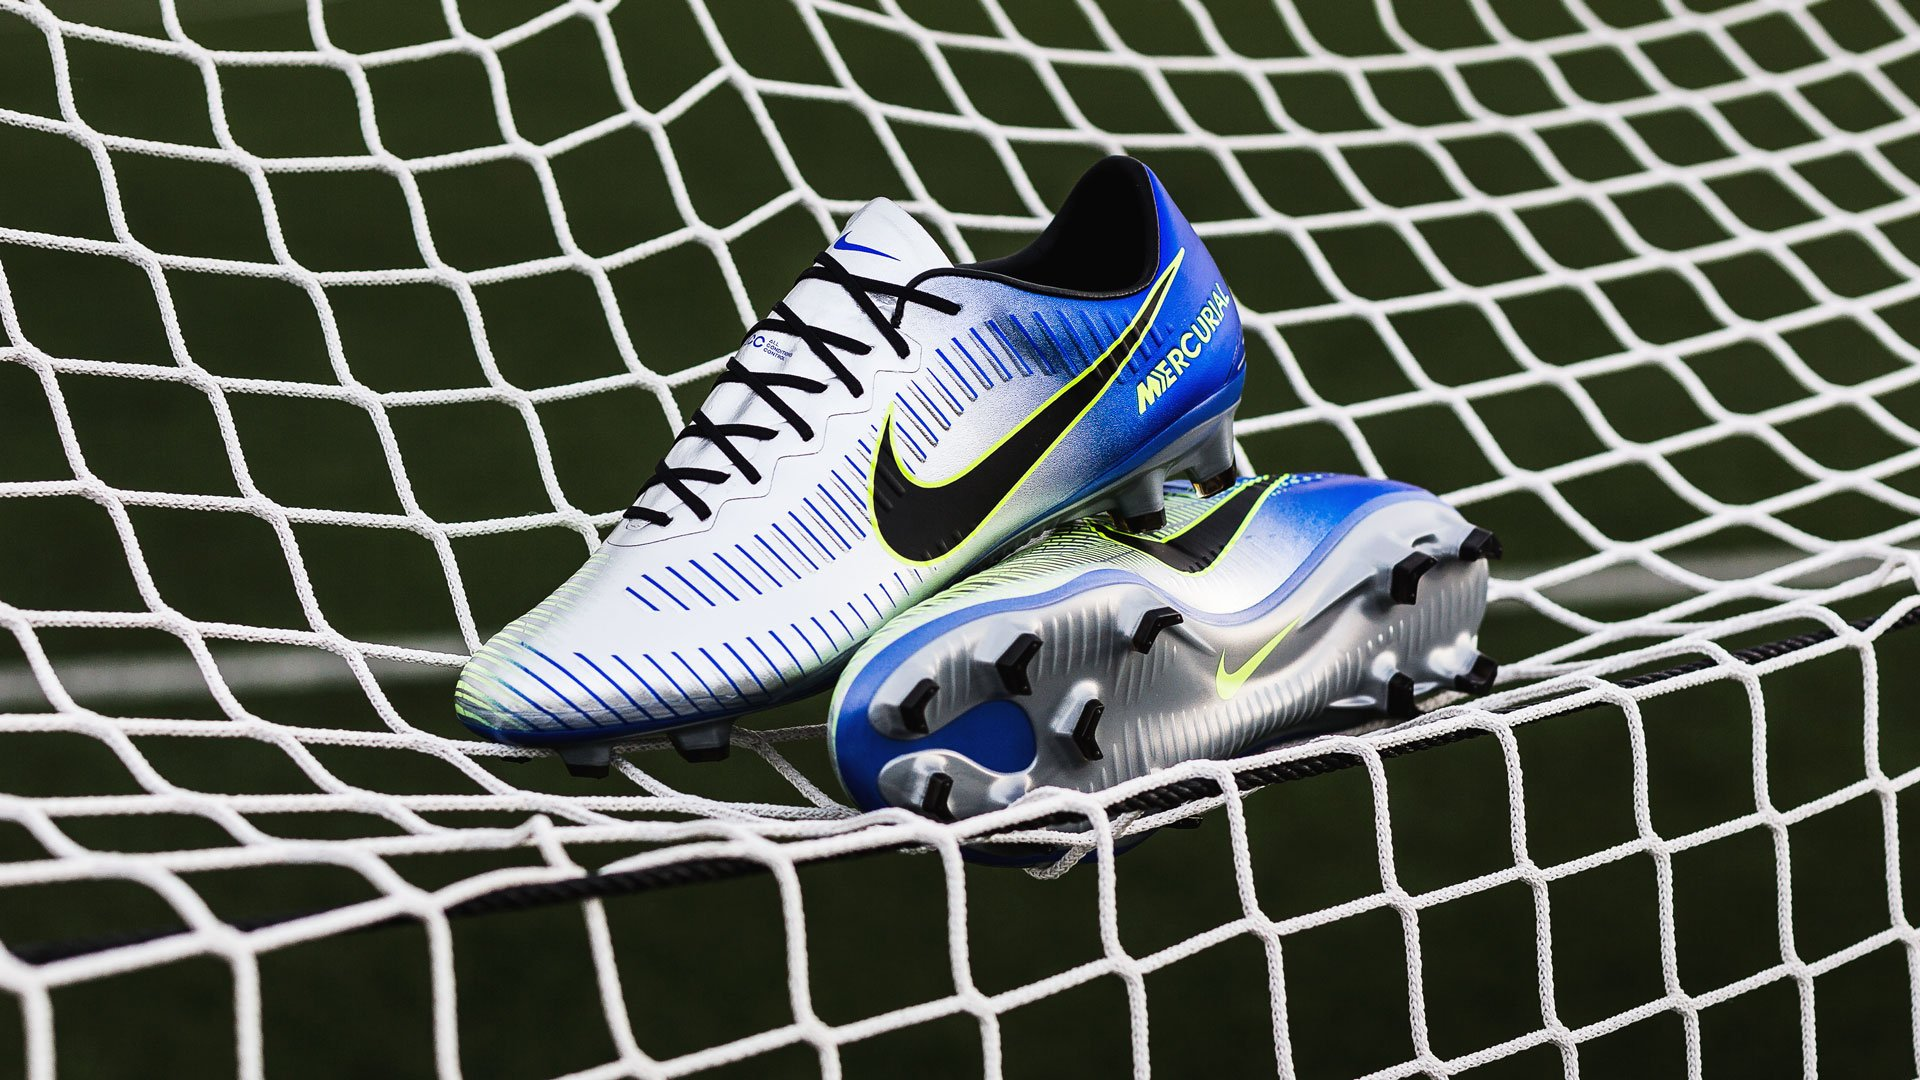 45f47e4af Introducing the Nike Mercurial Vapor XI NJR 'Puro Fenomeno'